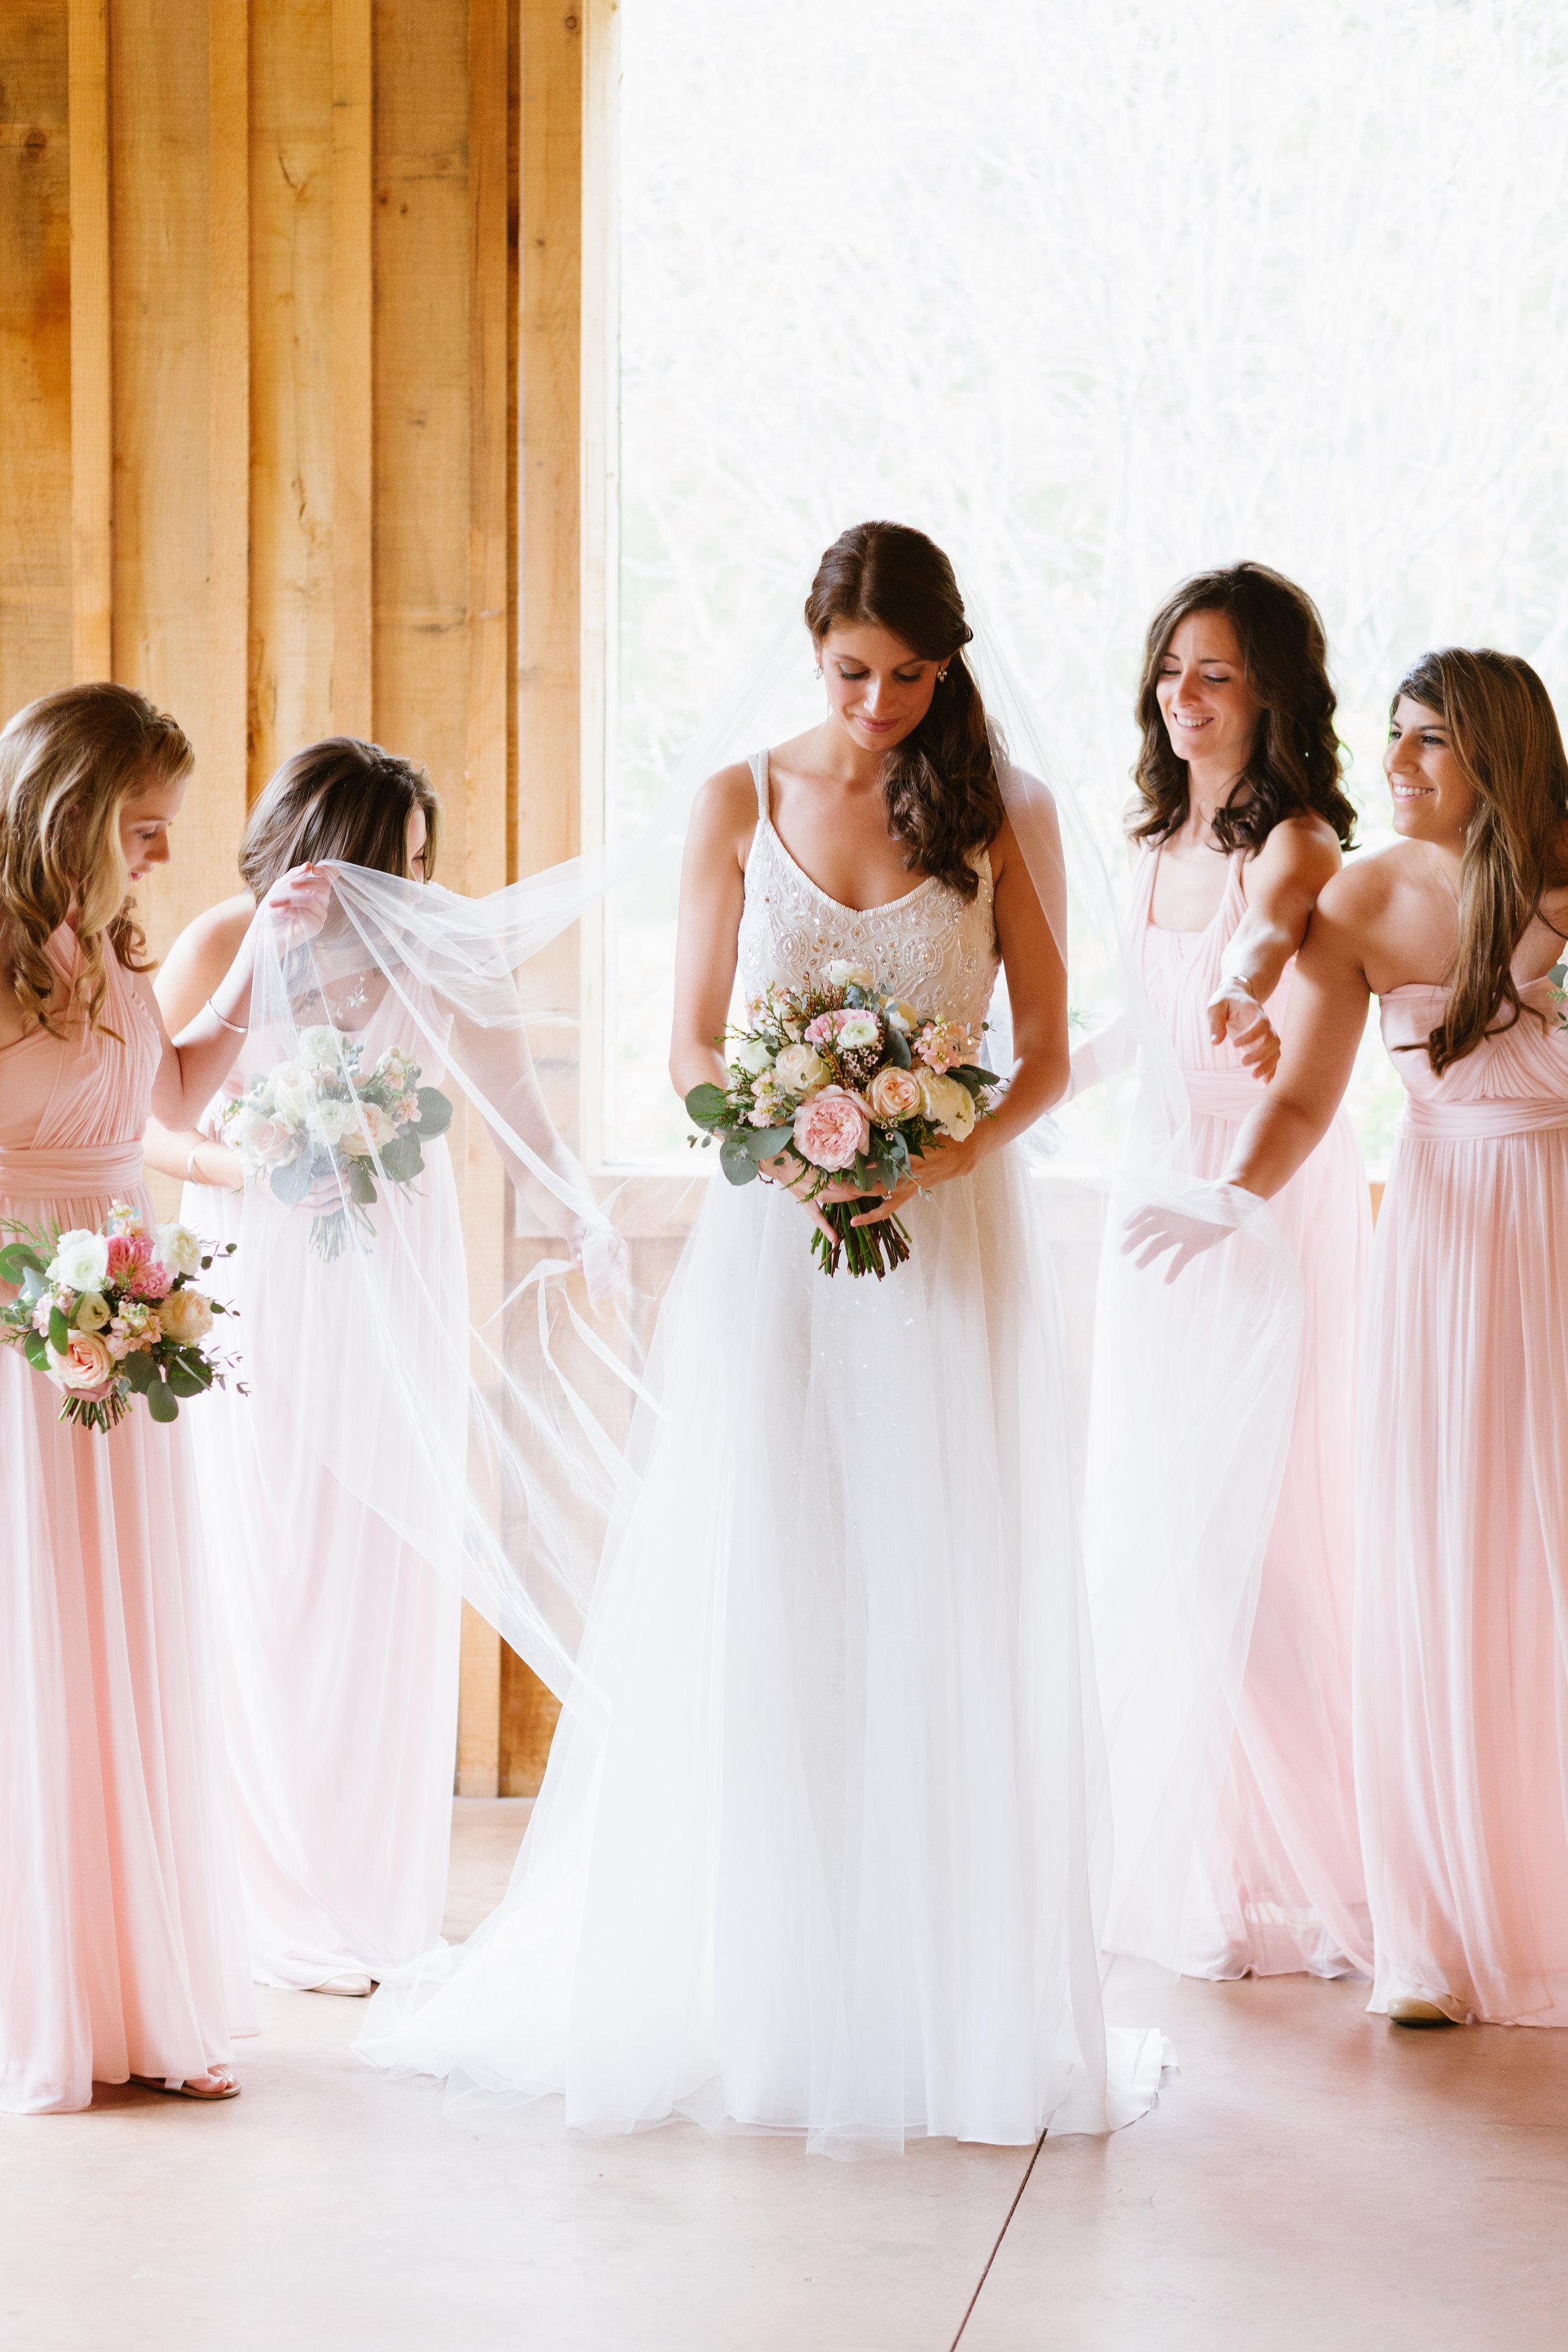 Bride Getting Ready // Natural Floral Design // Upscale Florist